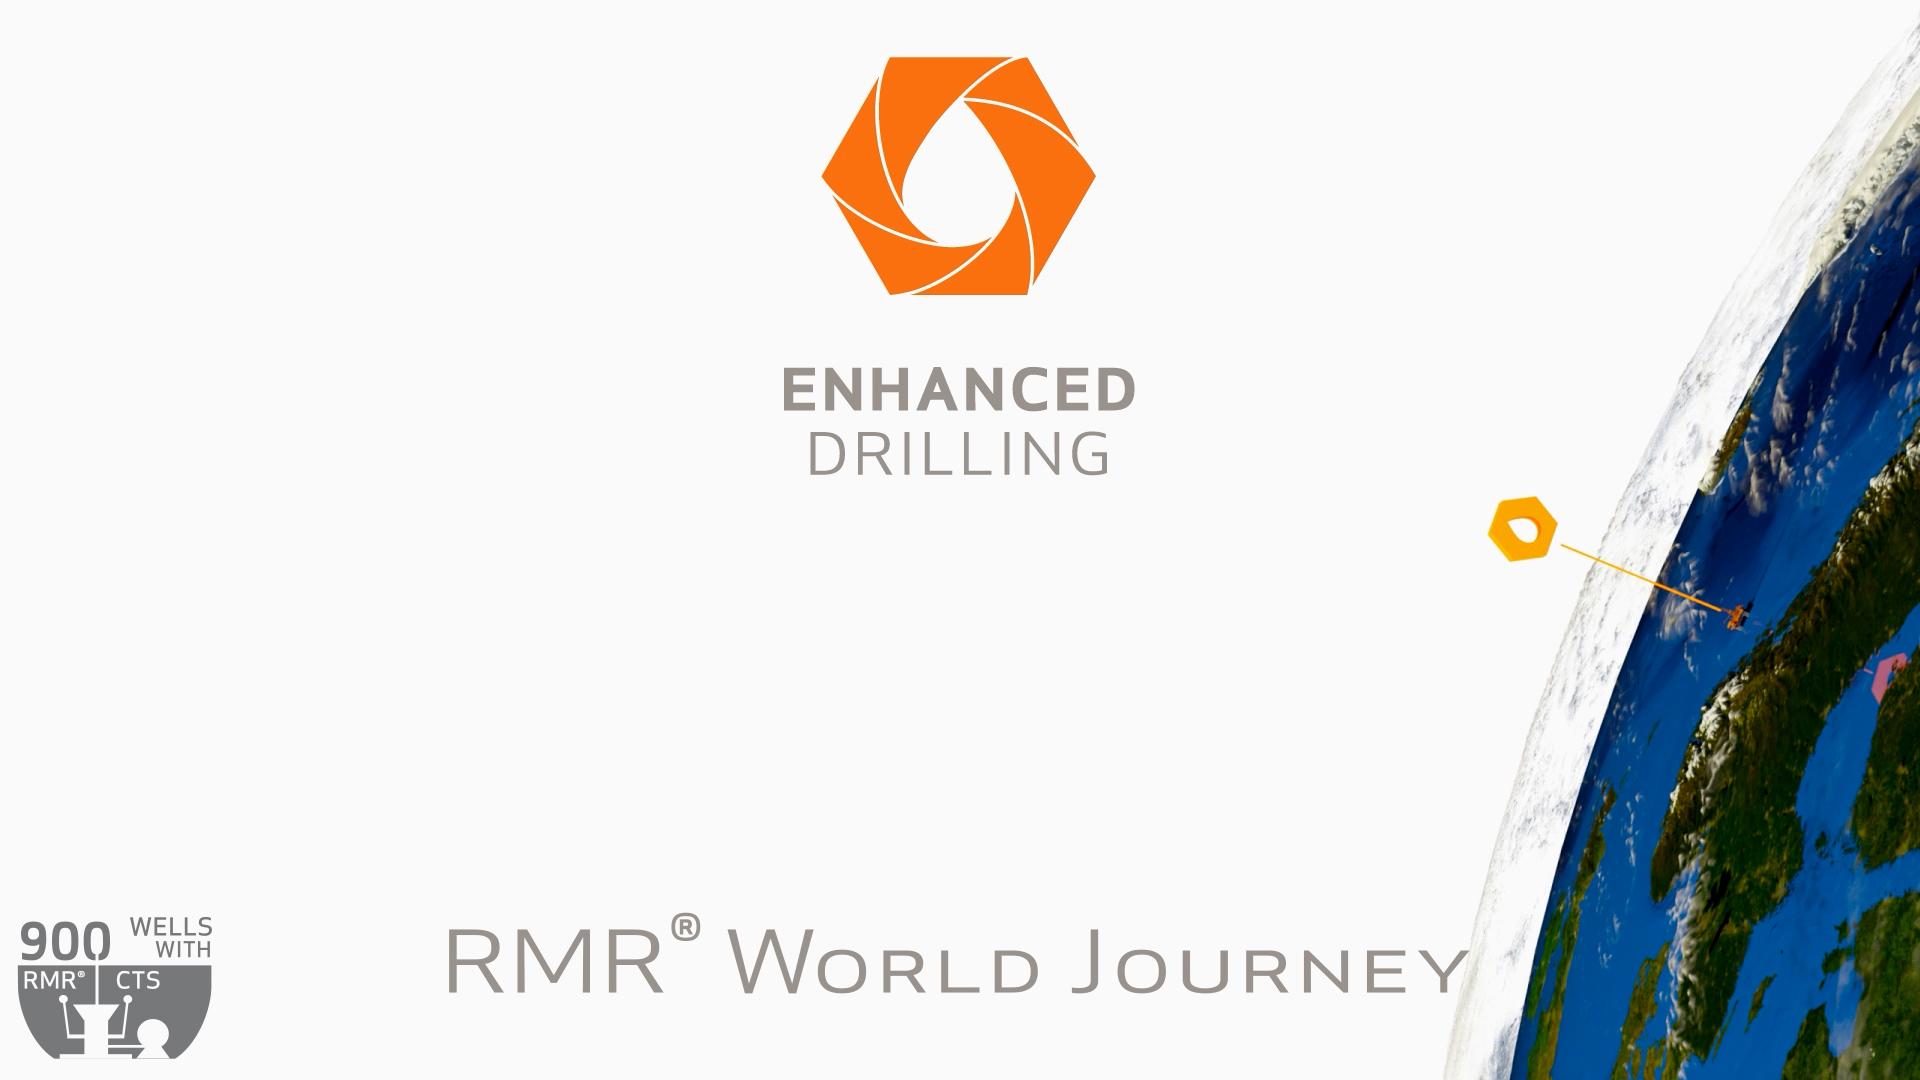 RMR® Technology World Journey